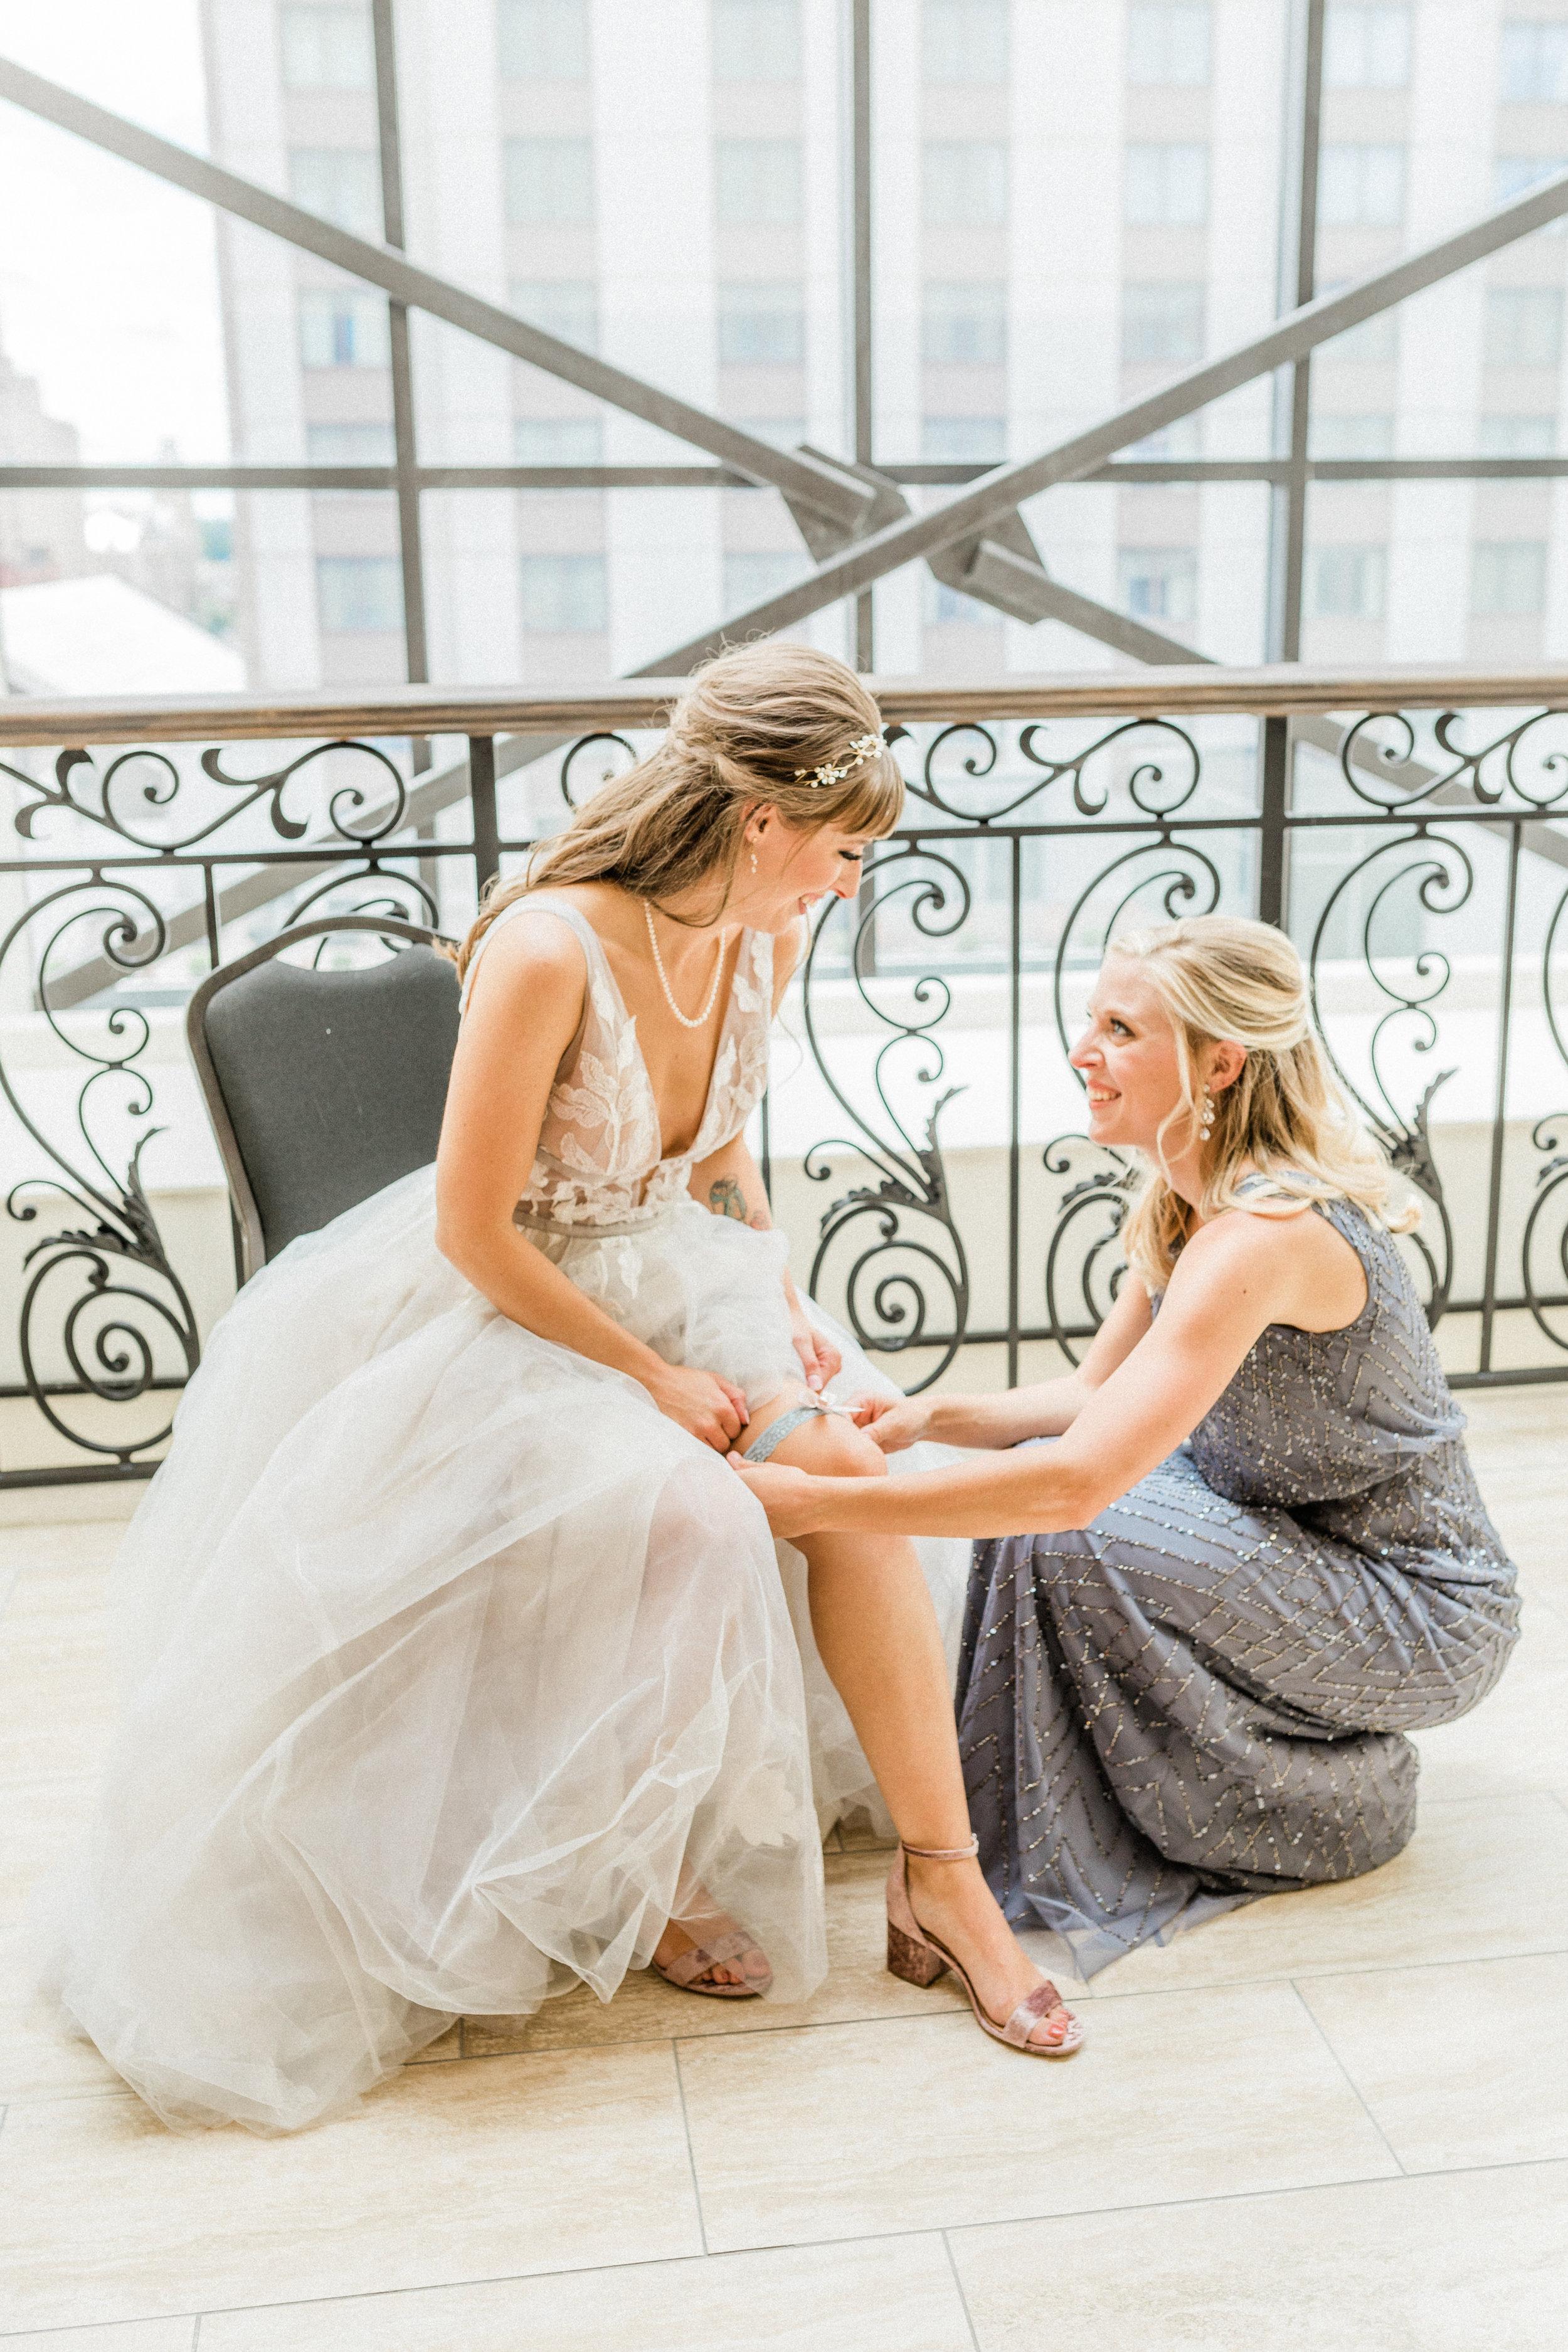 Mallory and Aaron - Married - Sneaks - Lauren Alisse Photography-14.jpg